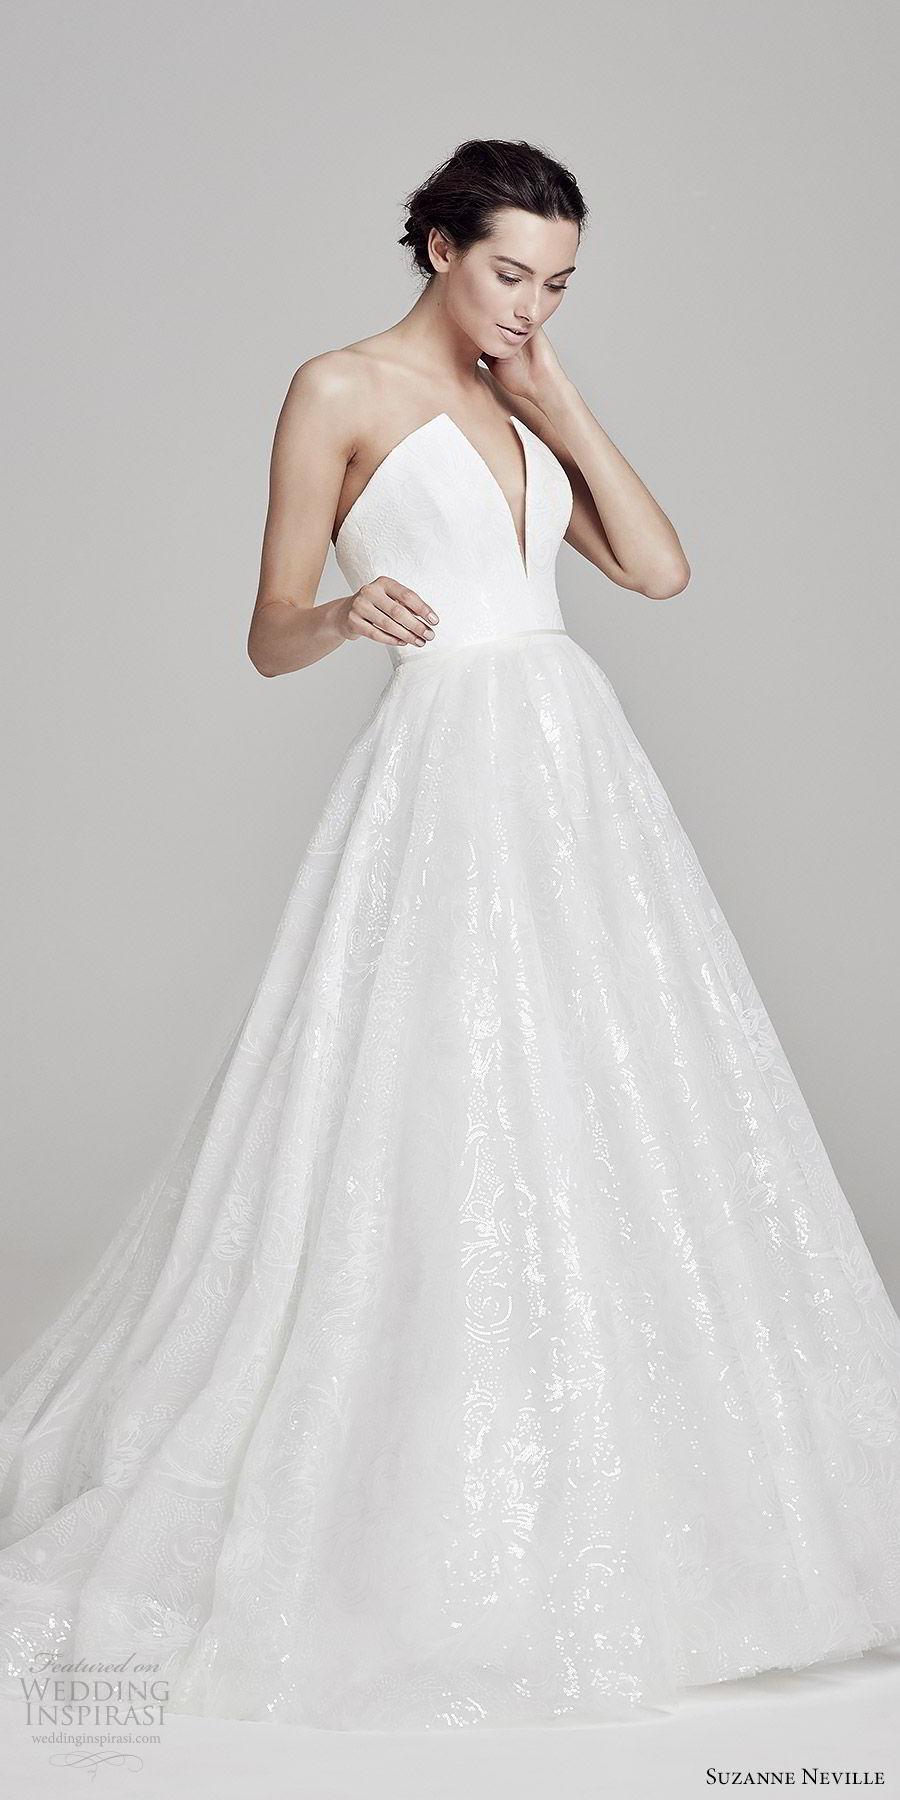 suzanne neville bridal 2019 strapless split plunging v neck a line embellished skirt ball gown wedding dress (seraphina) modern romantic mv